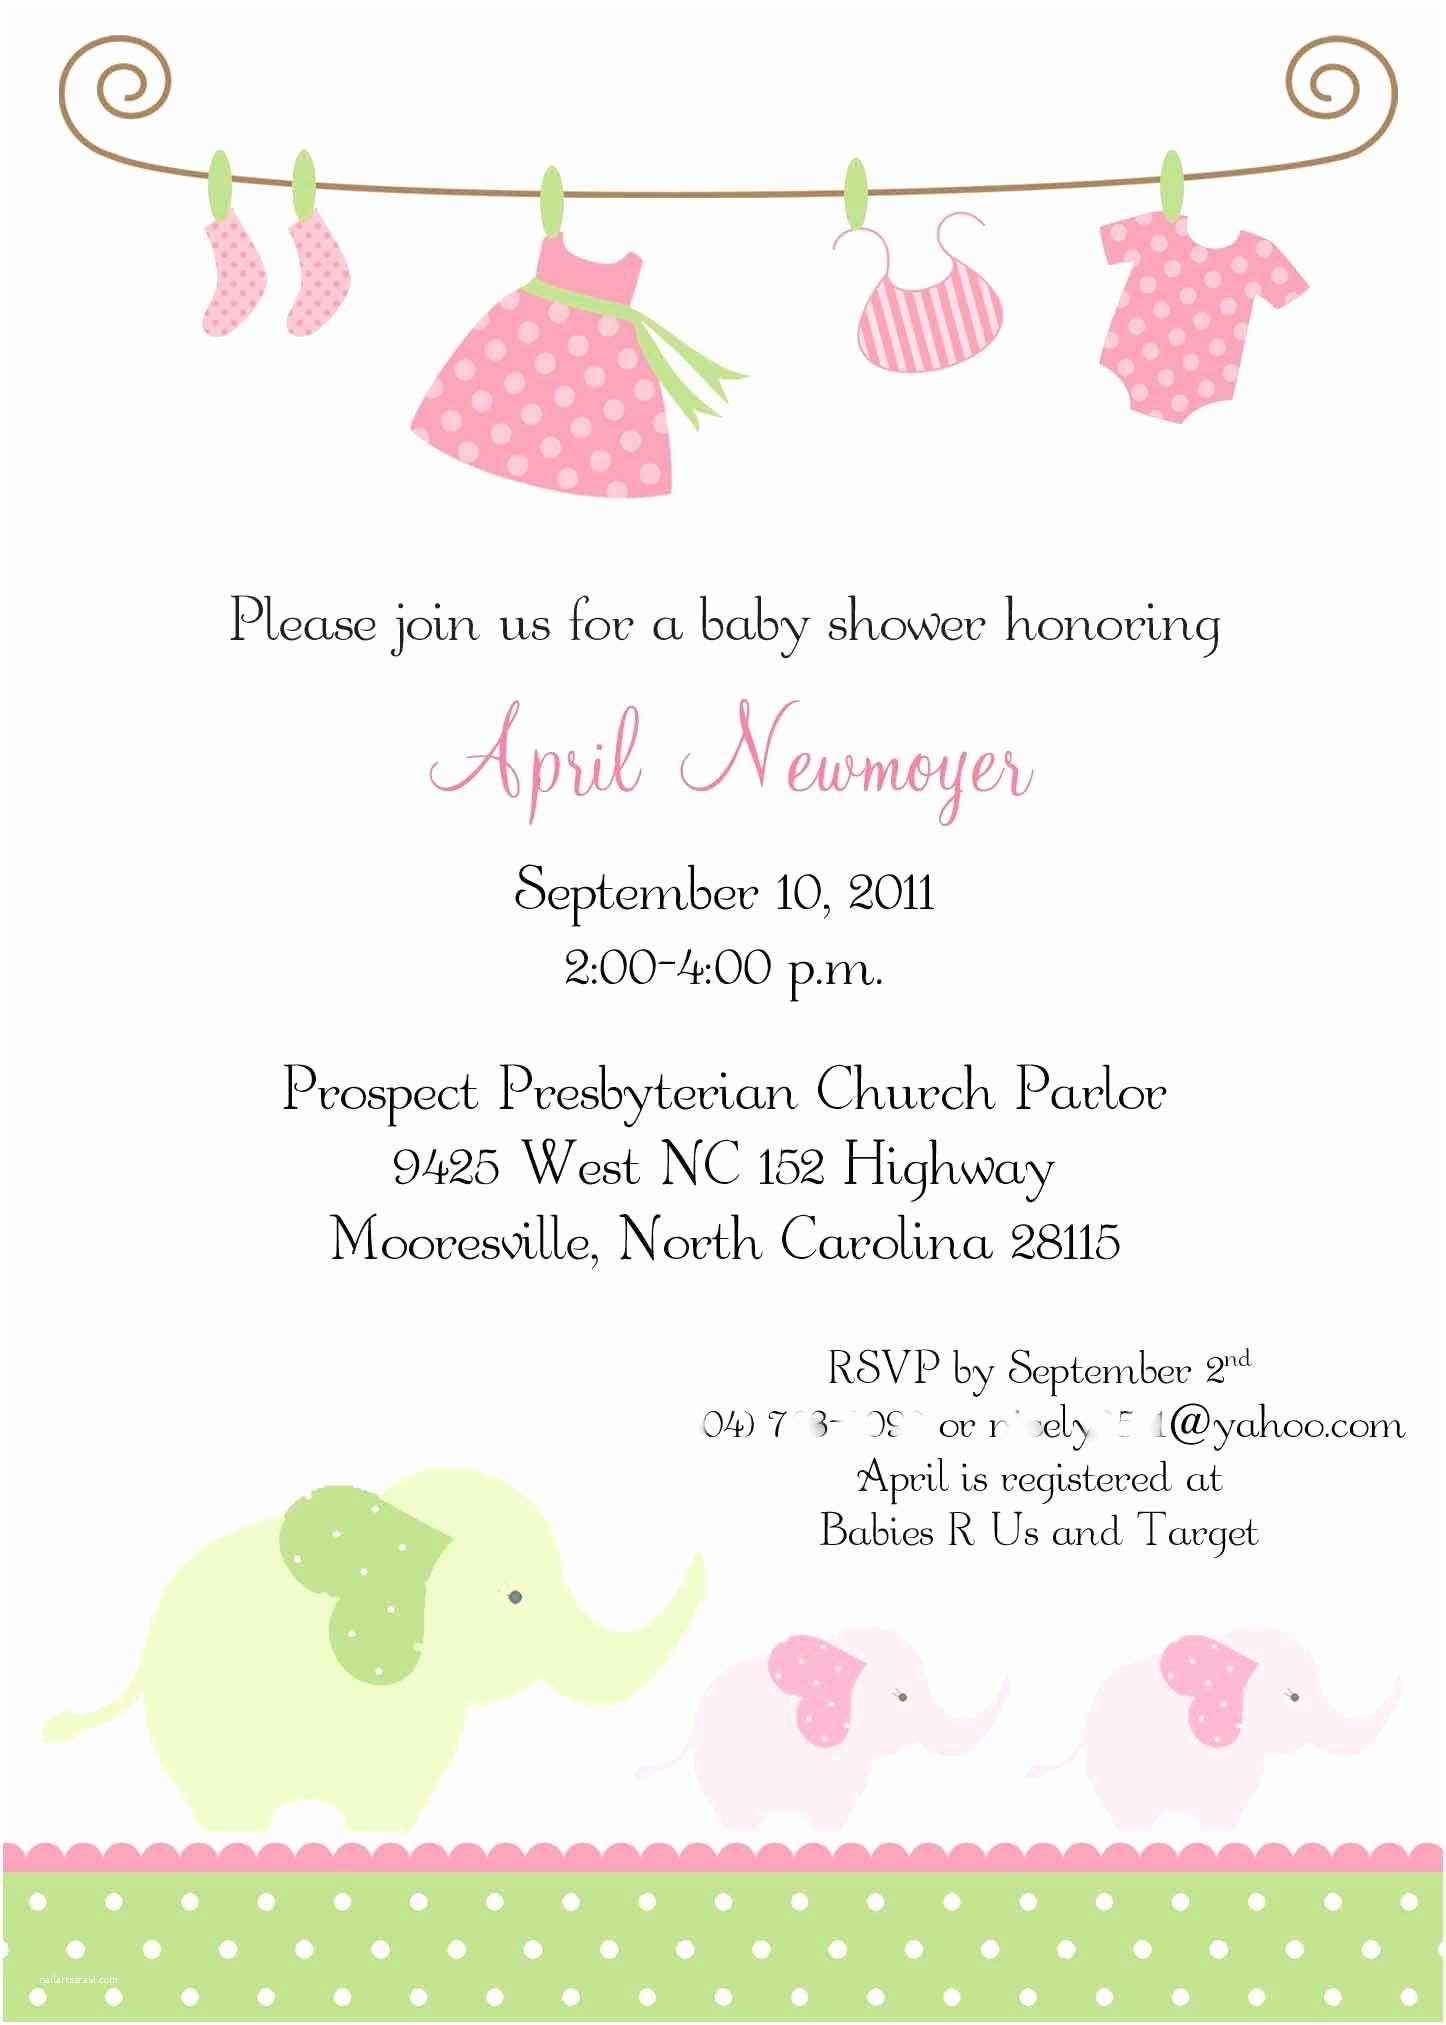 Baby Shower Invitation Girl Ideas Of Baby Shower Invitations for Girls